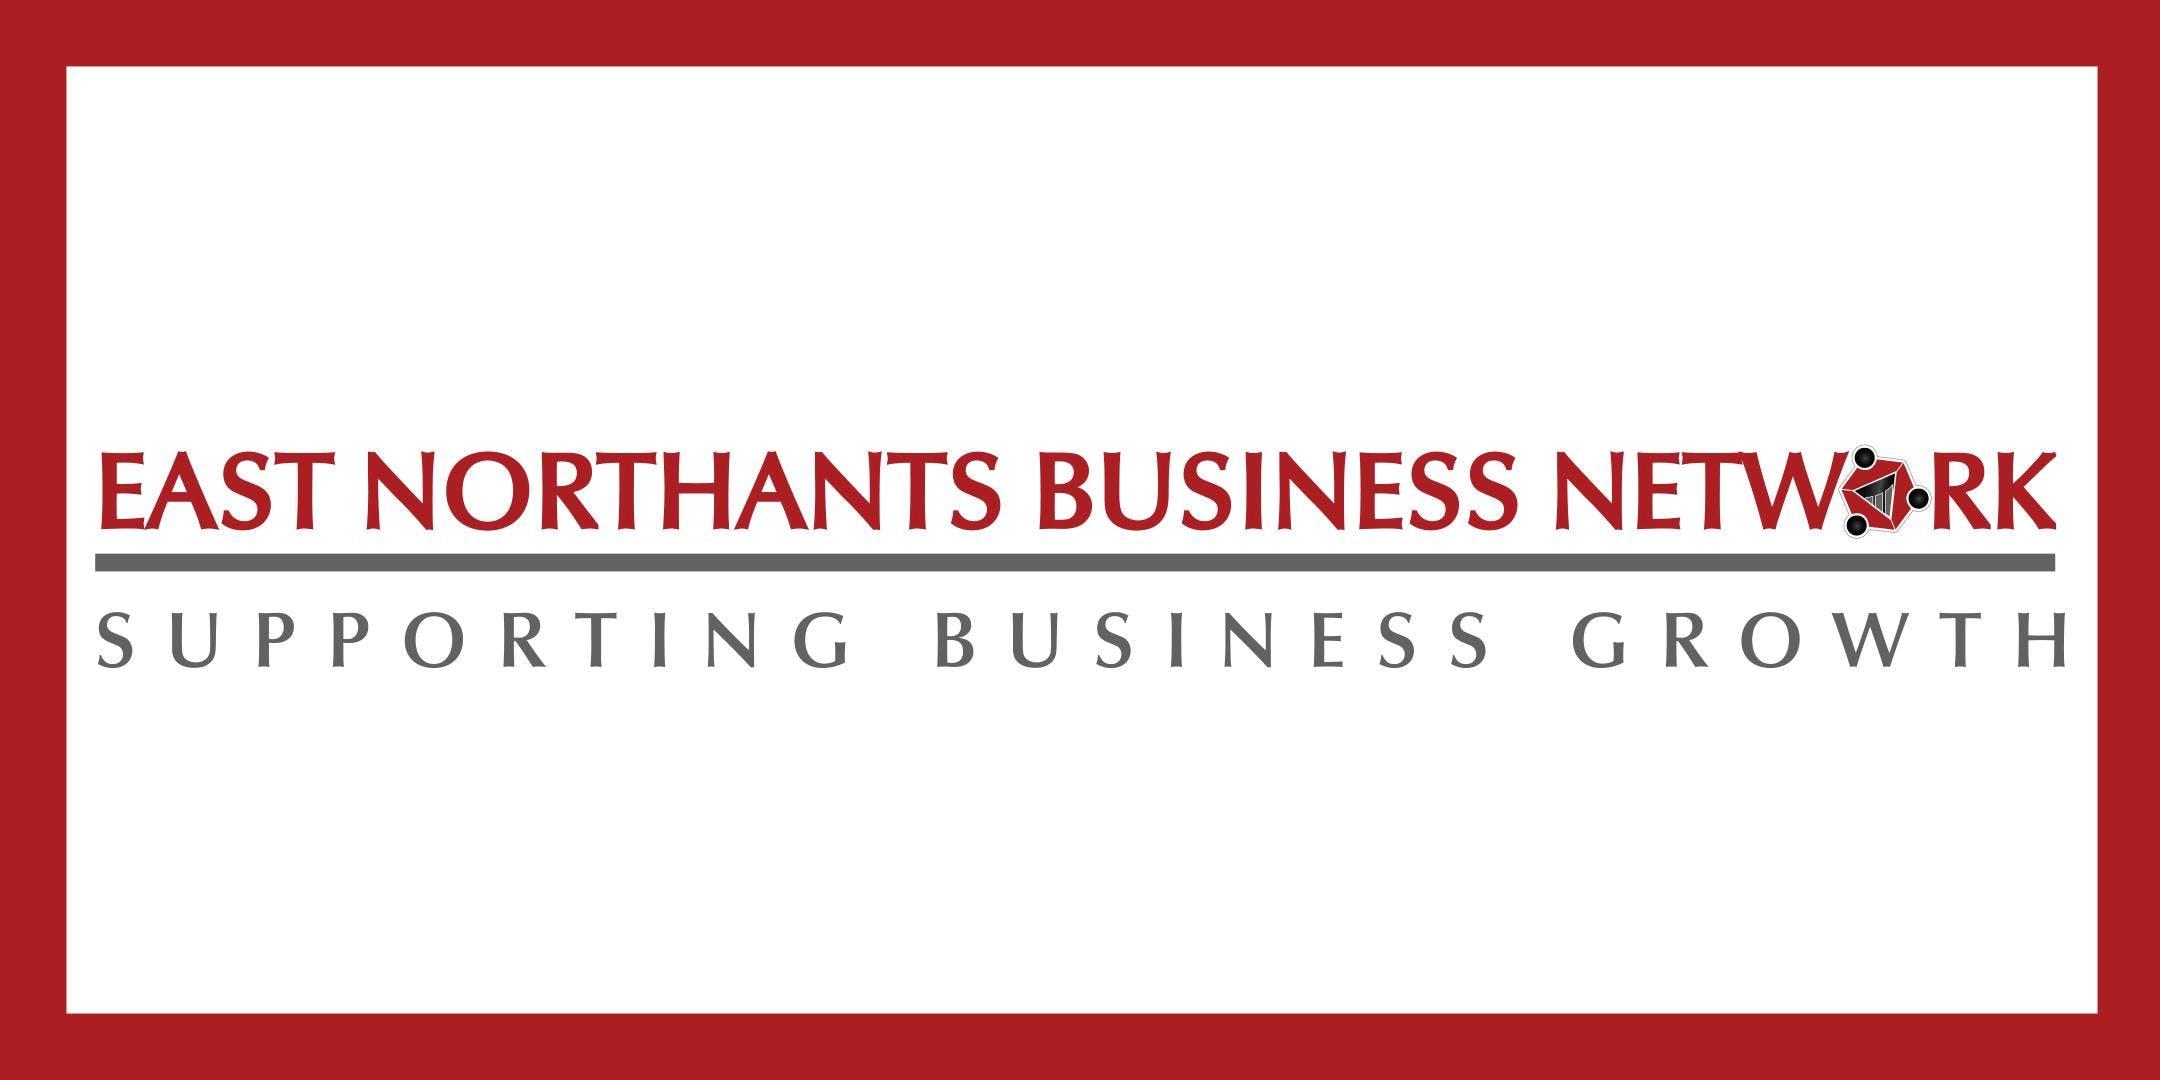 East Northants Business Network February 2019